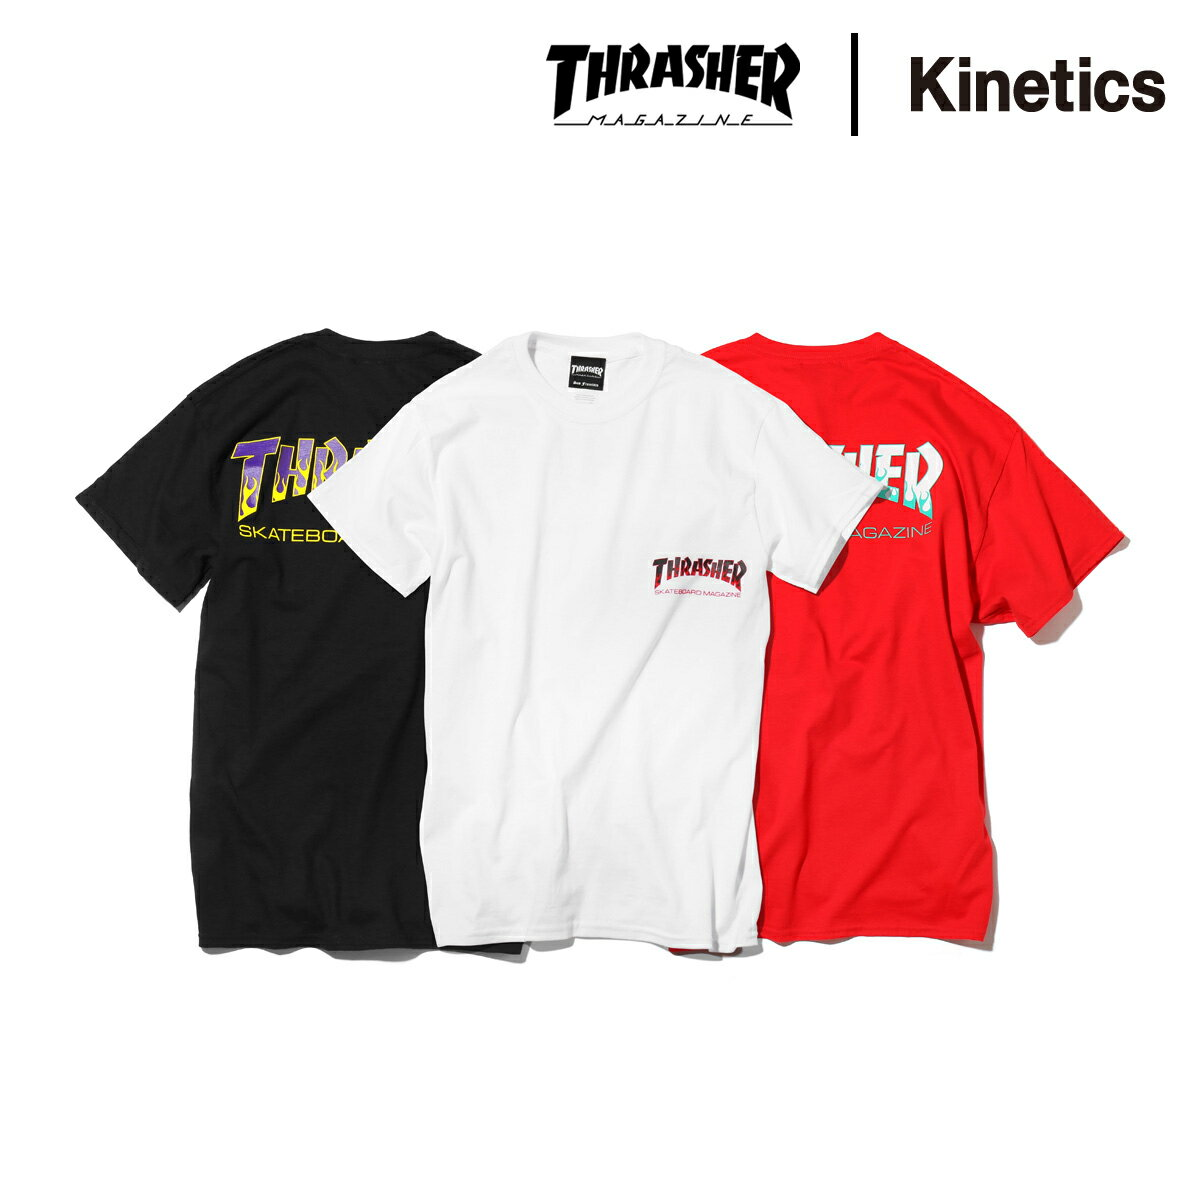 THRASHER for Kinetics BBQ-2 TEE (3色展開) 【メンズサイズ】【18SS-I】